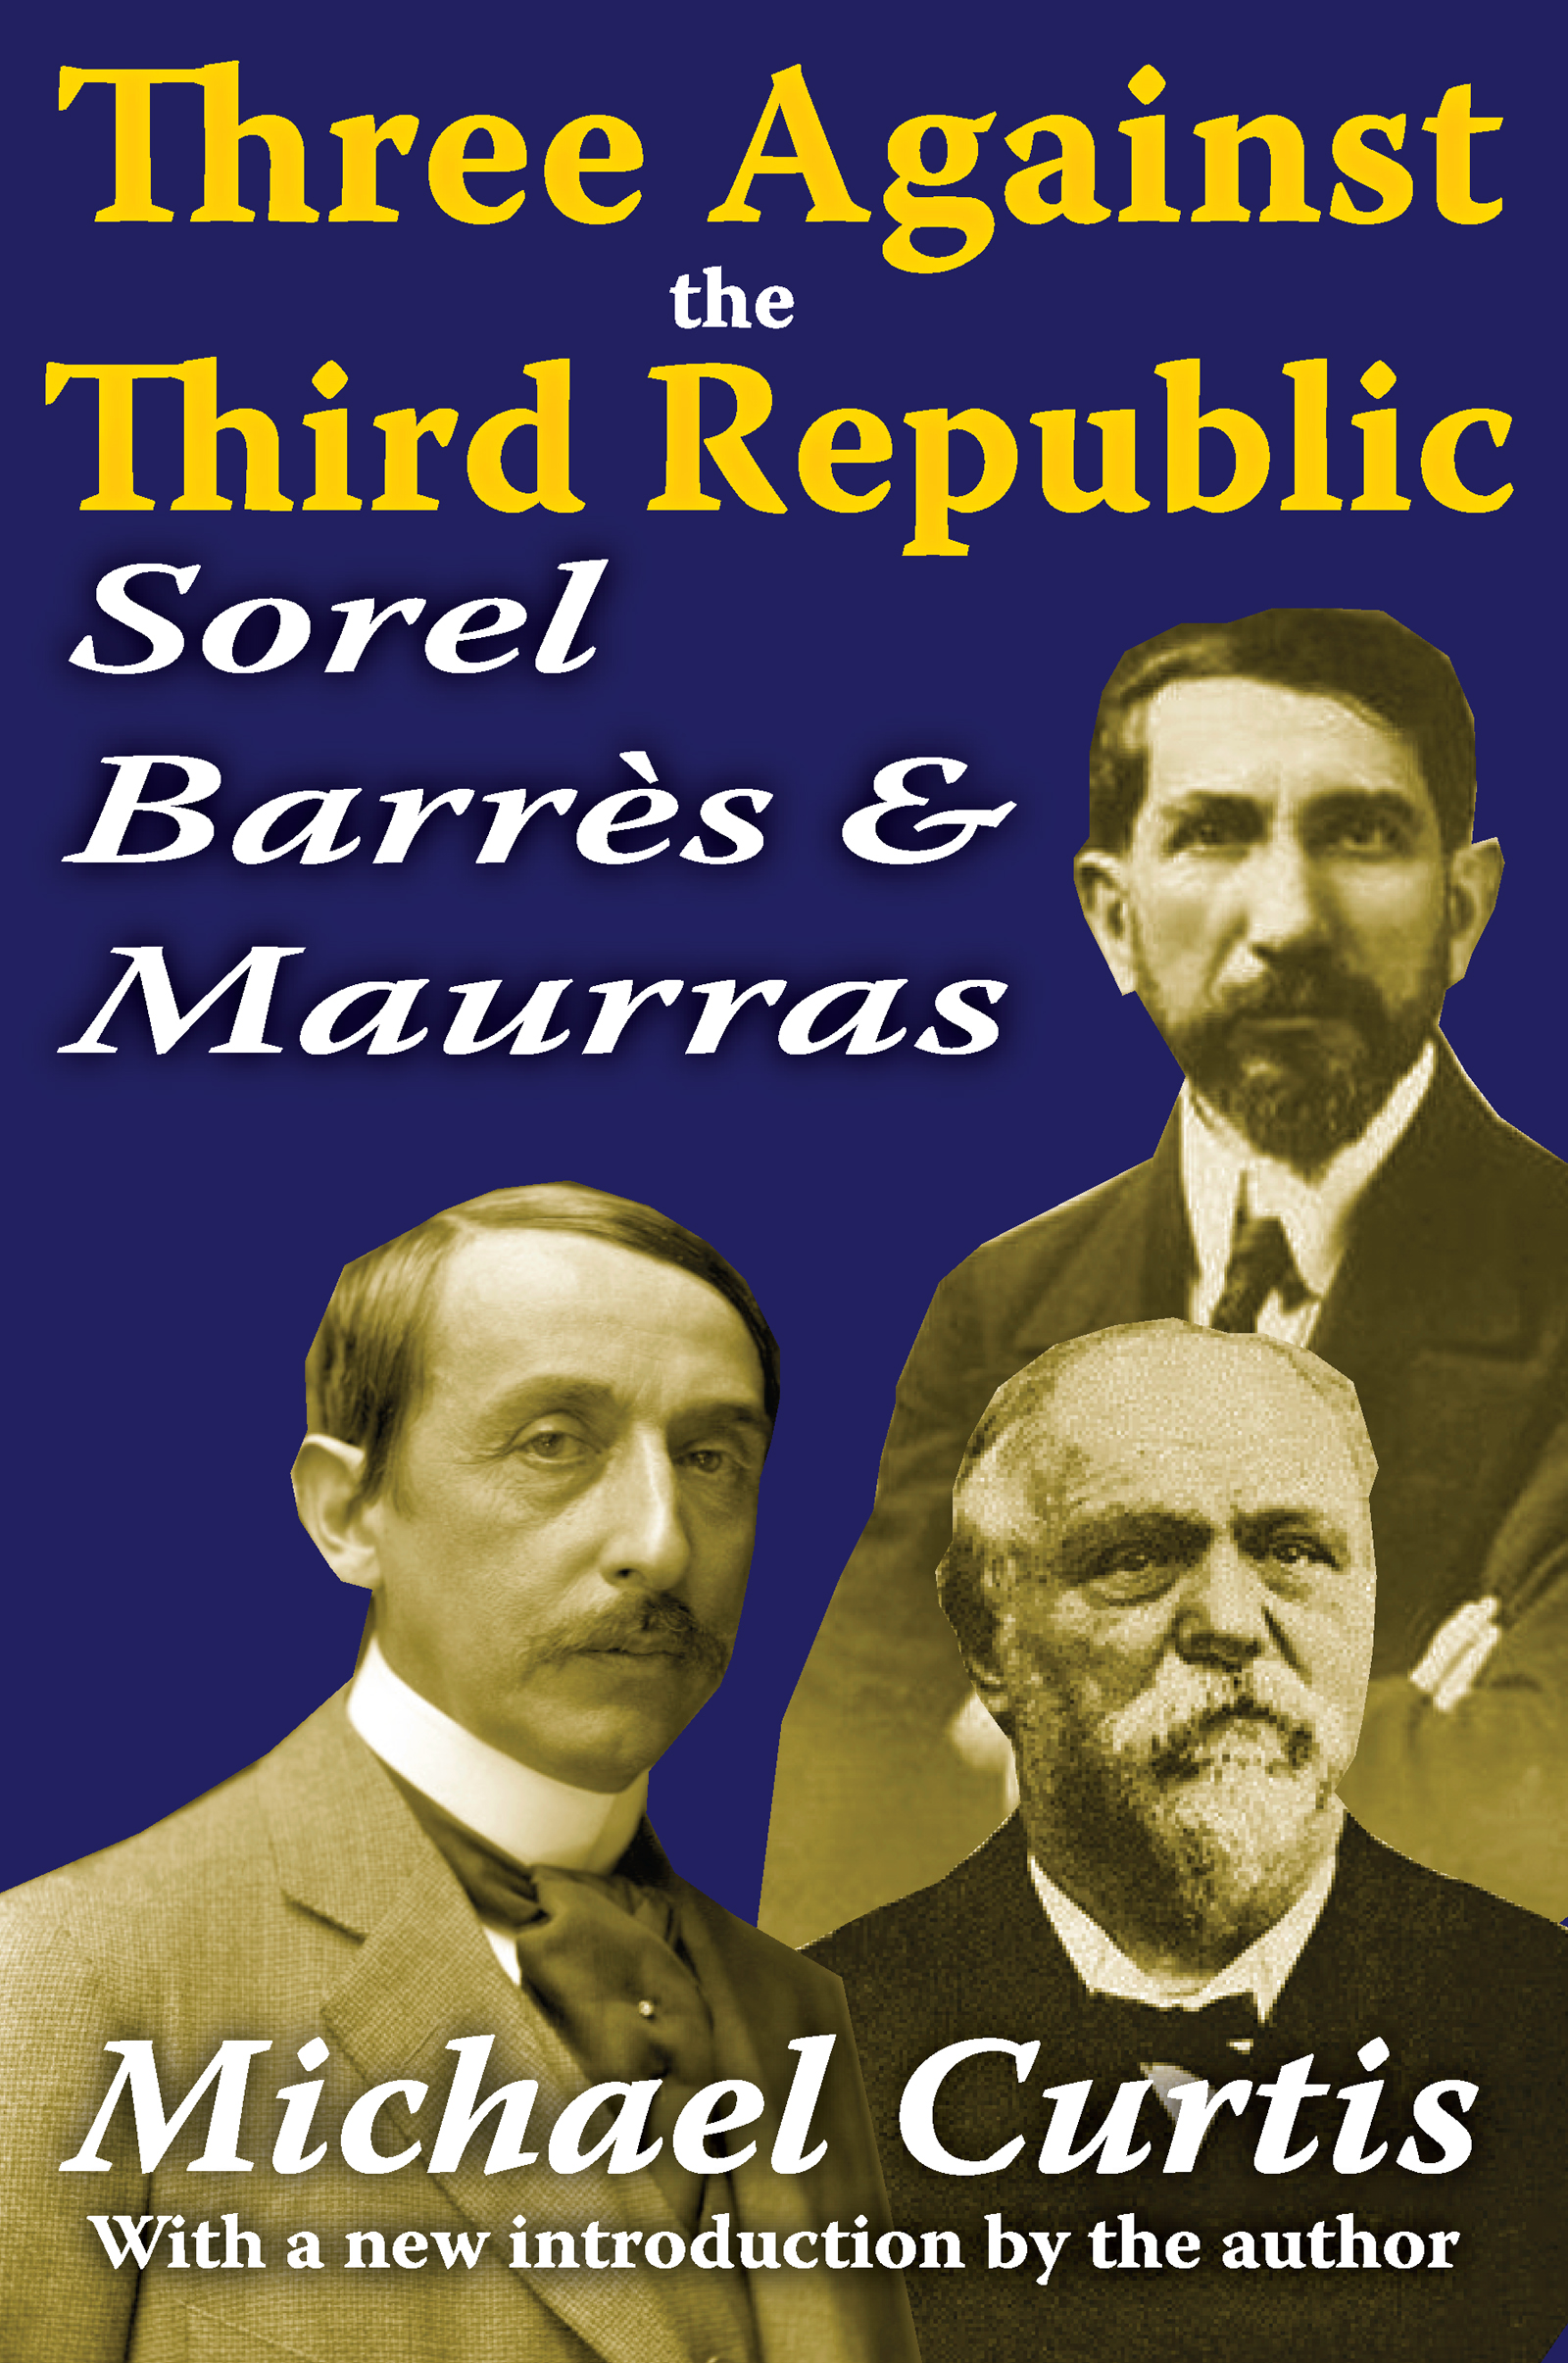 Three Against the Third Republic